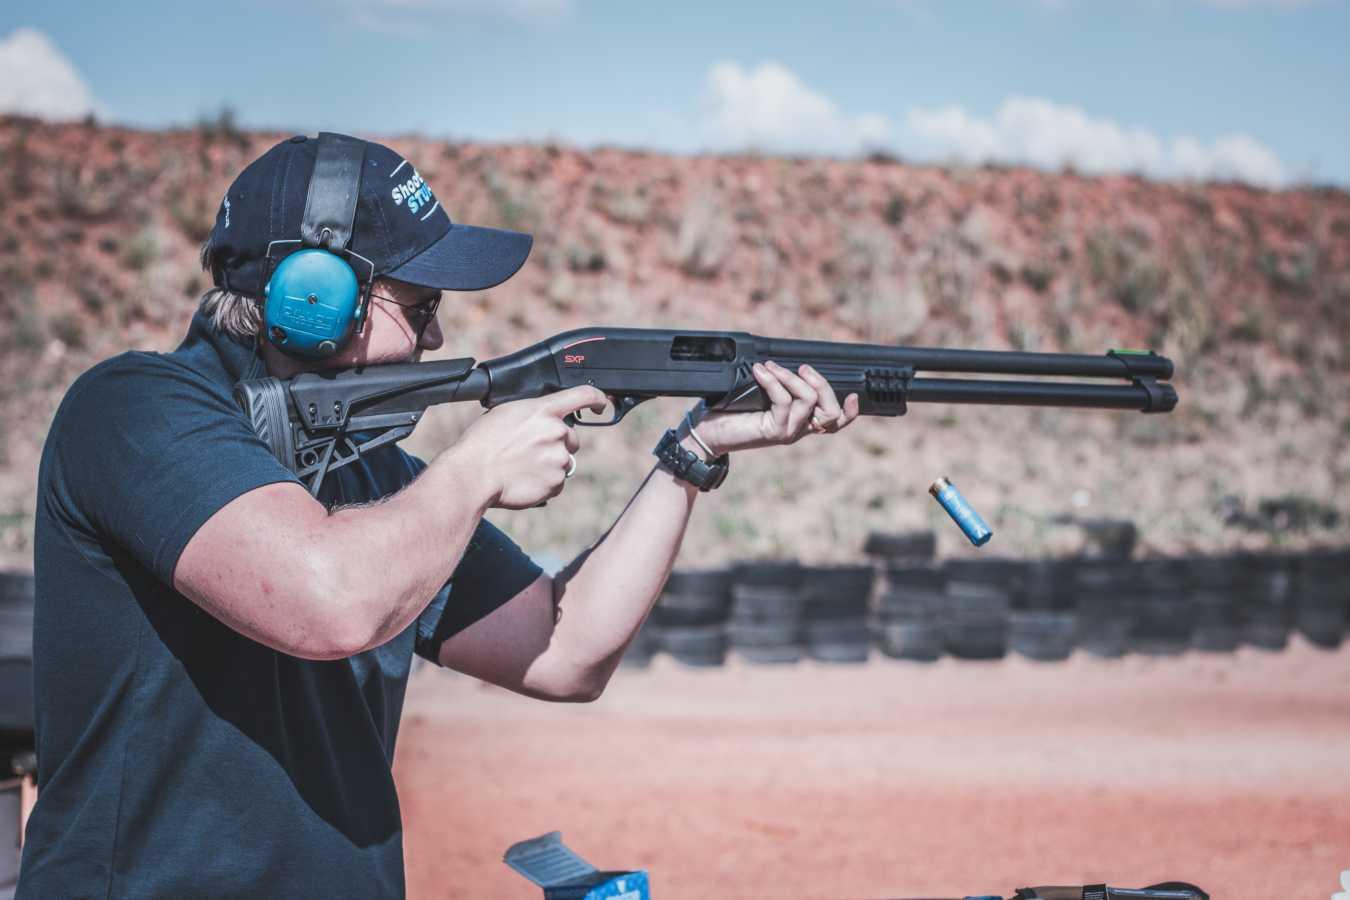 live chat benefits for gun vendors